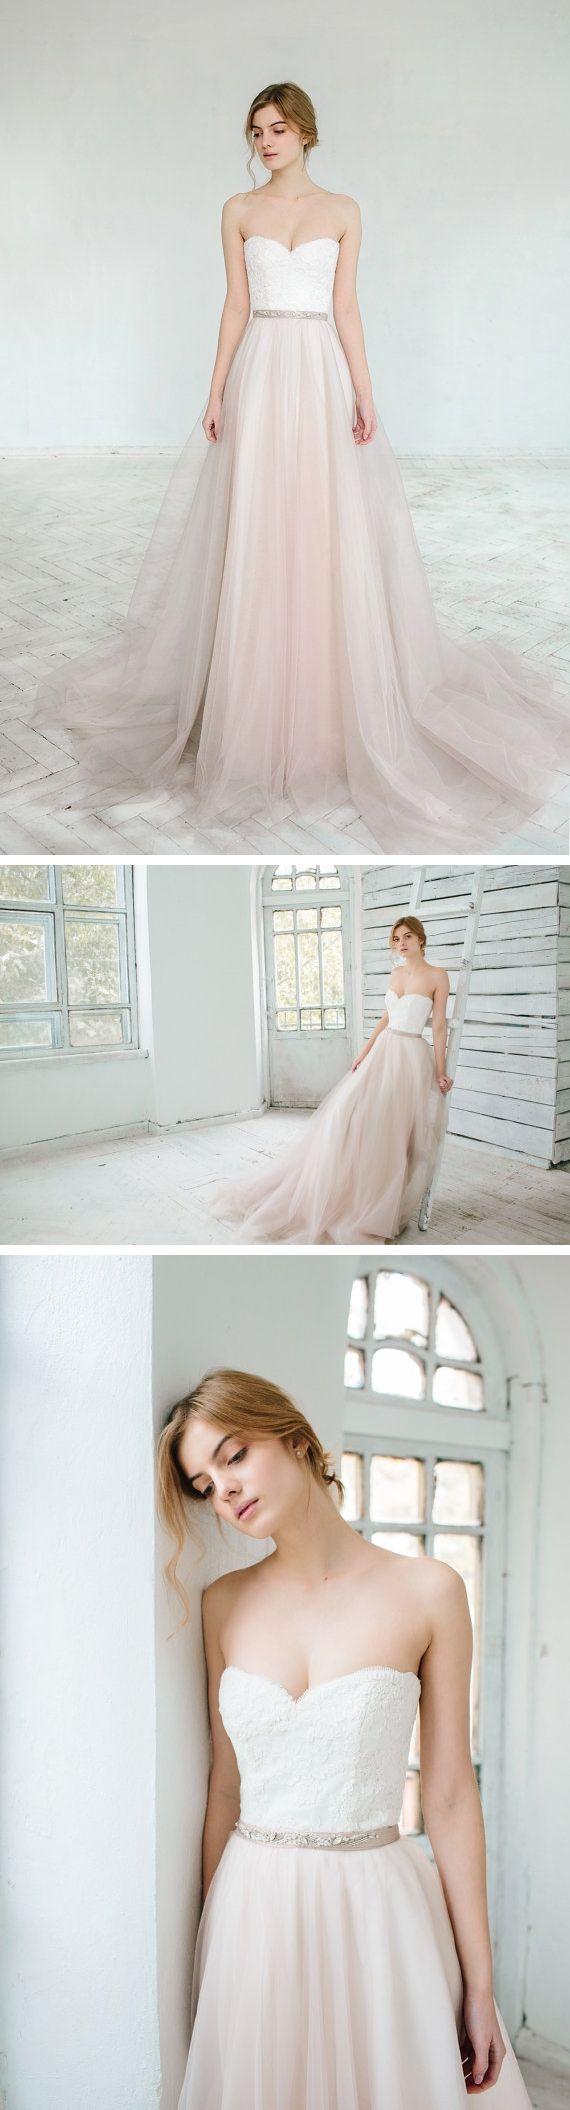 زفاف - Wedding Dress Of The Week - A Blushing Bride